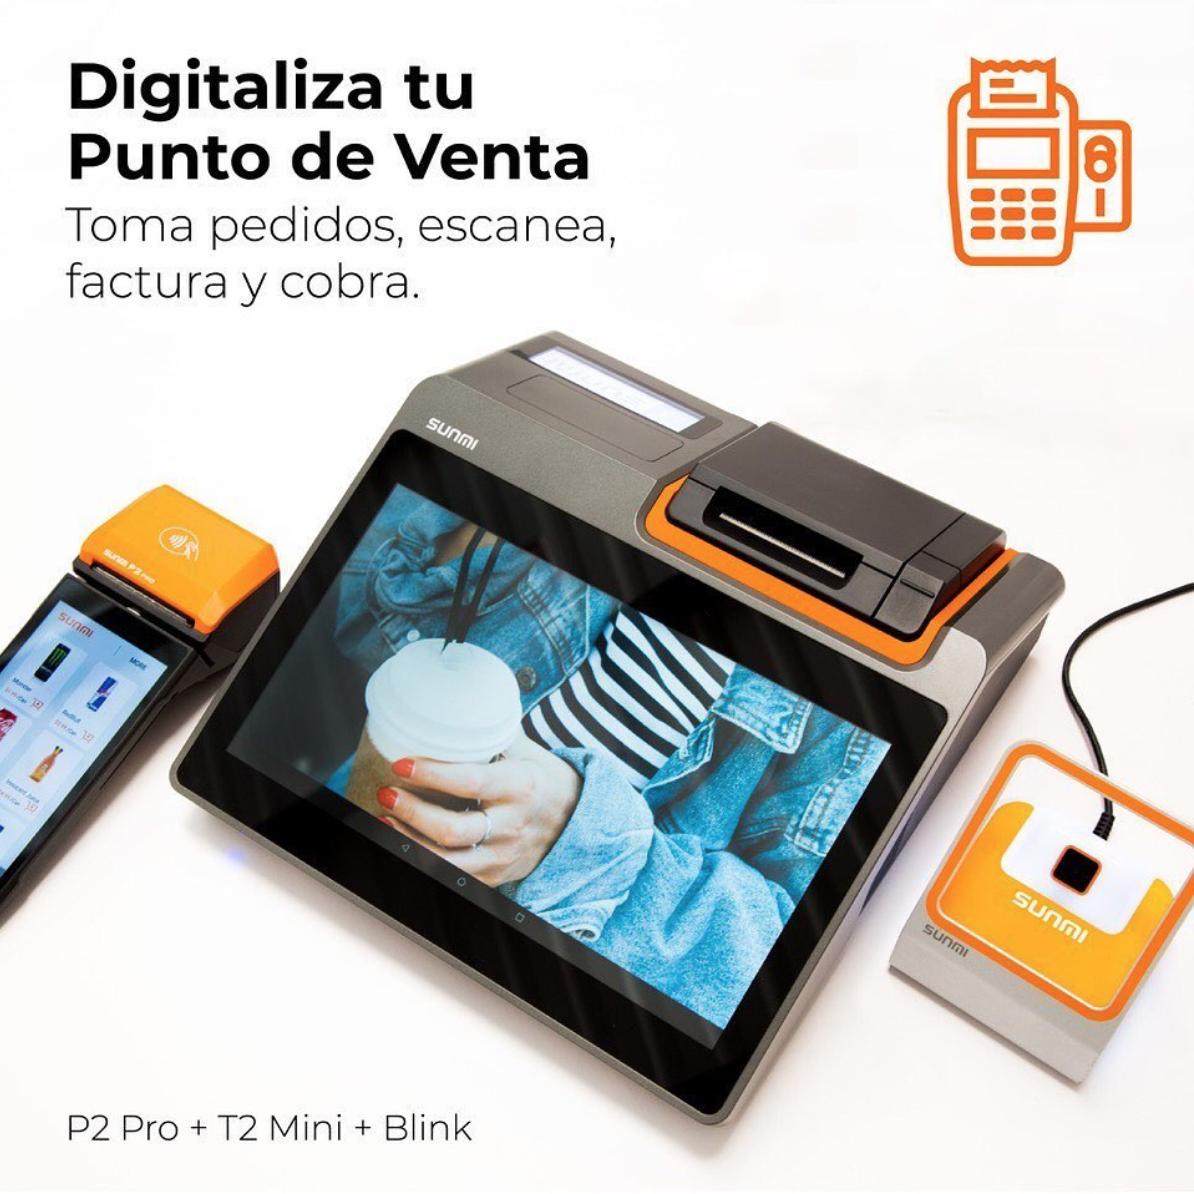 digitaliza tu punto de venta